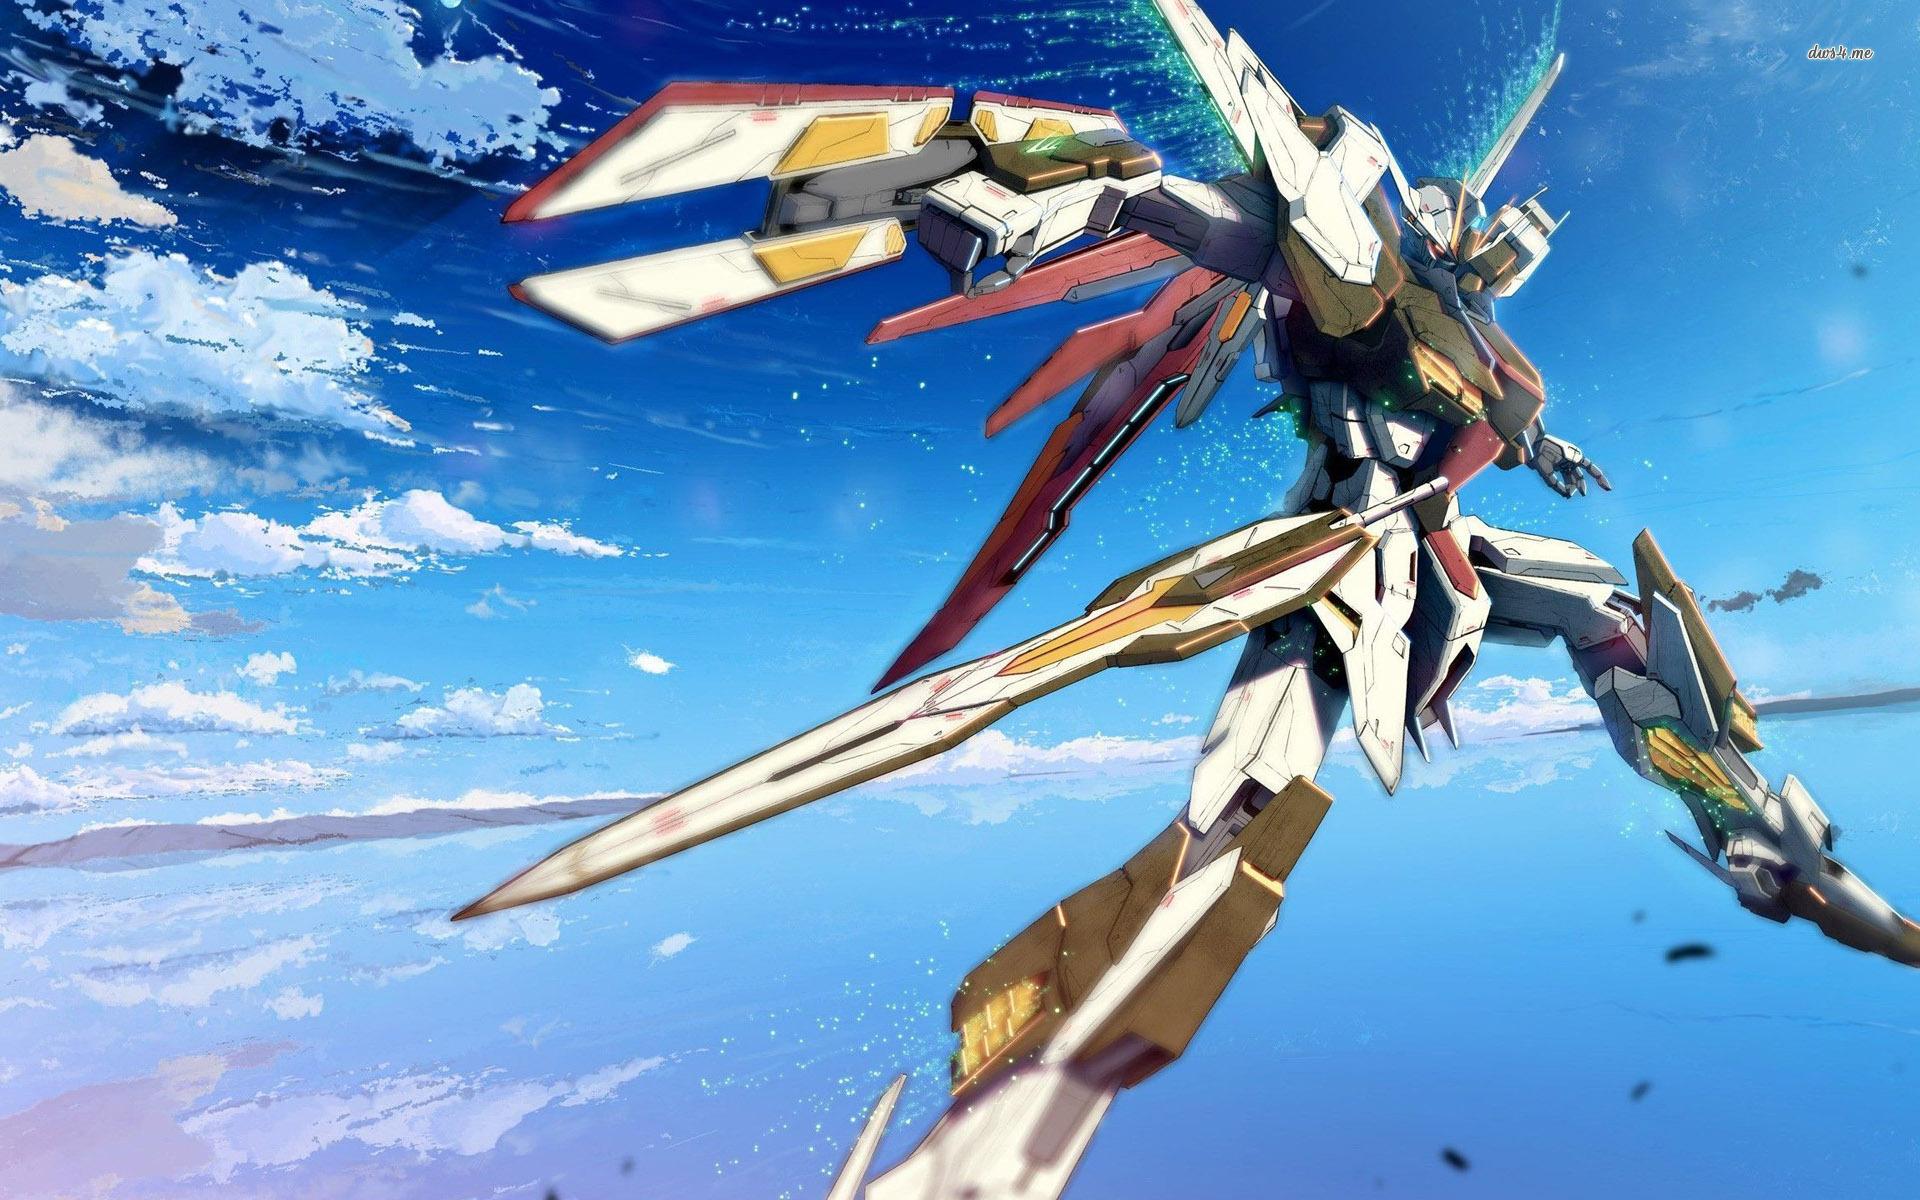 Mobile Suit Gundam Wallpaper 1920x1200